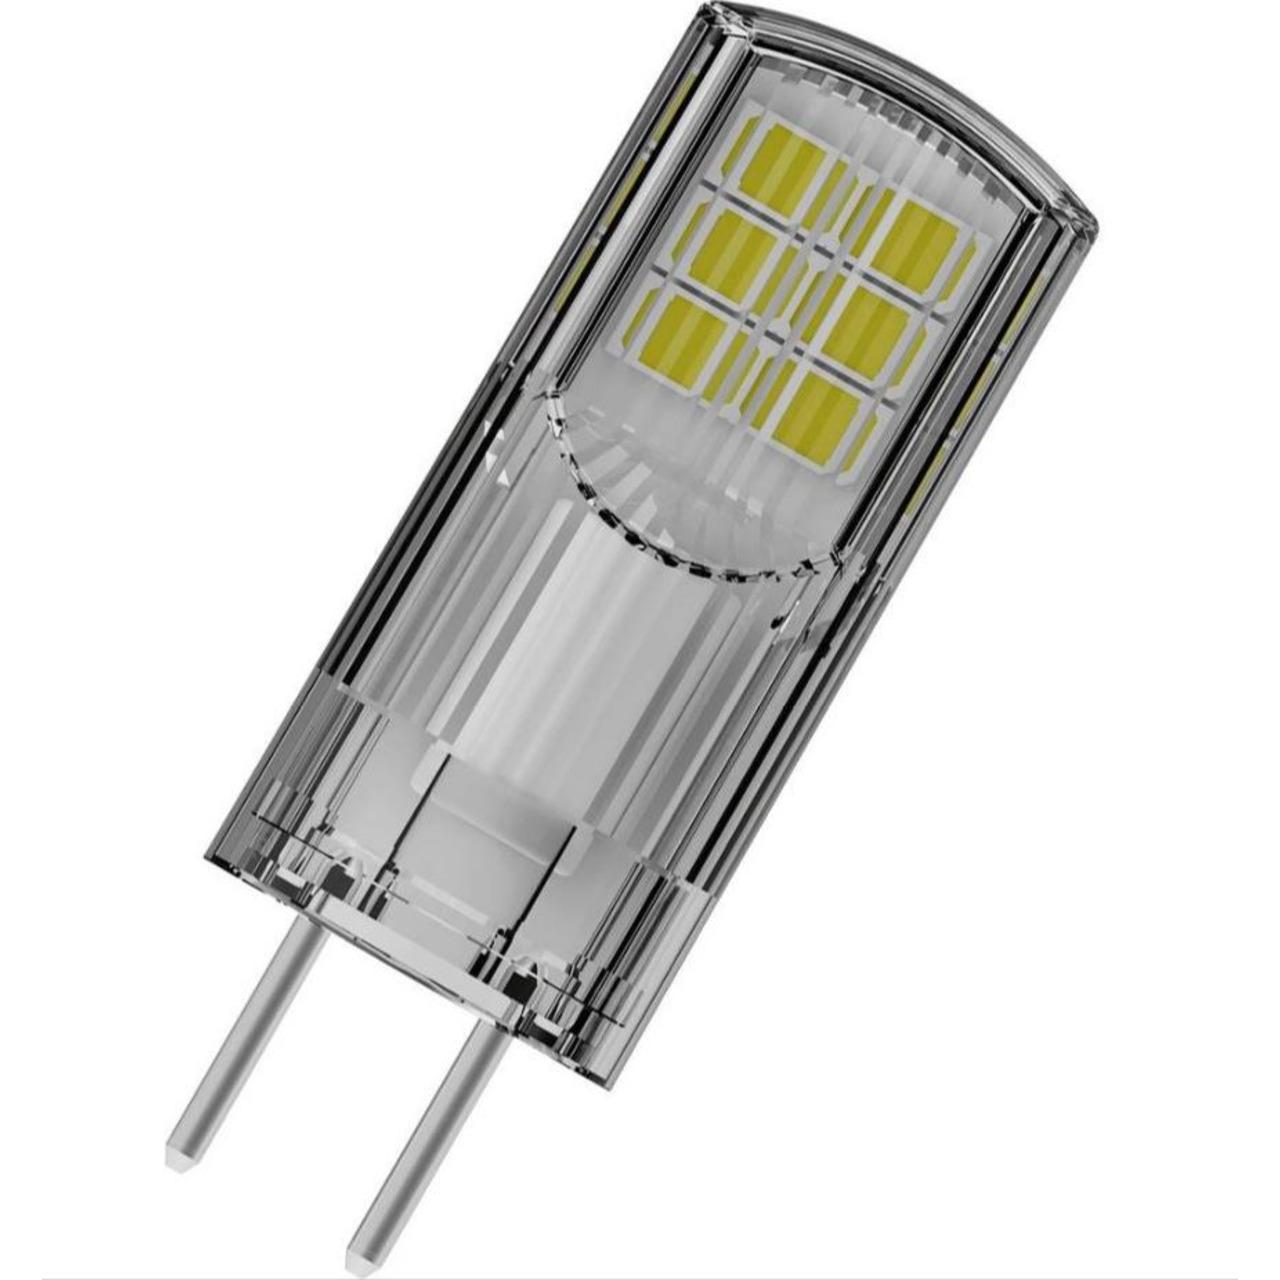 OSRAM LED STAR PIN 2-6-W-GY6-35-LED-Lampe- warmweiss